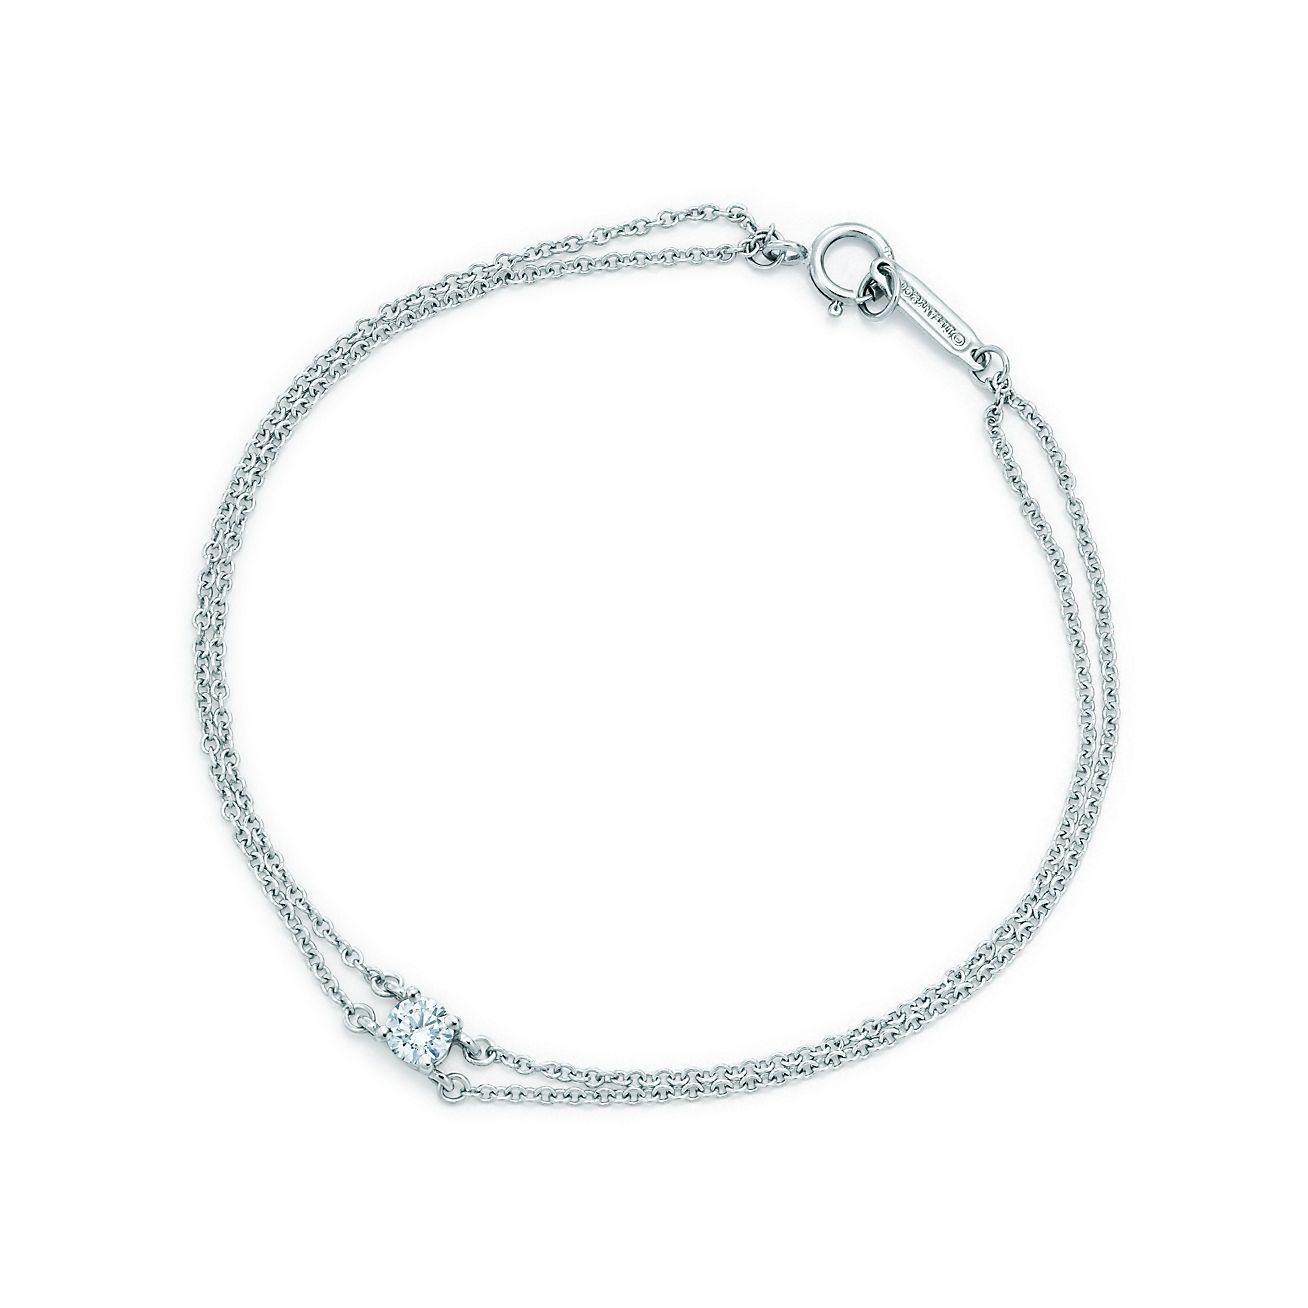 Tiffany Solitaire Diamond Bracelet In Platinum Tiffany Co